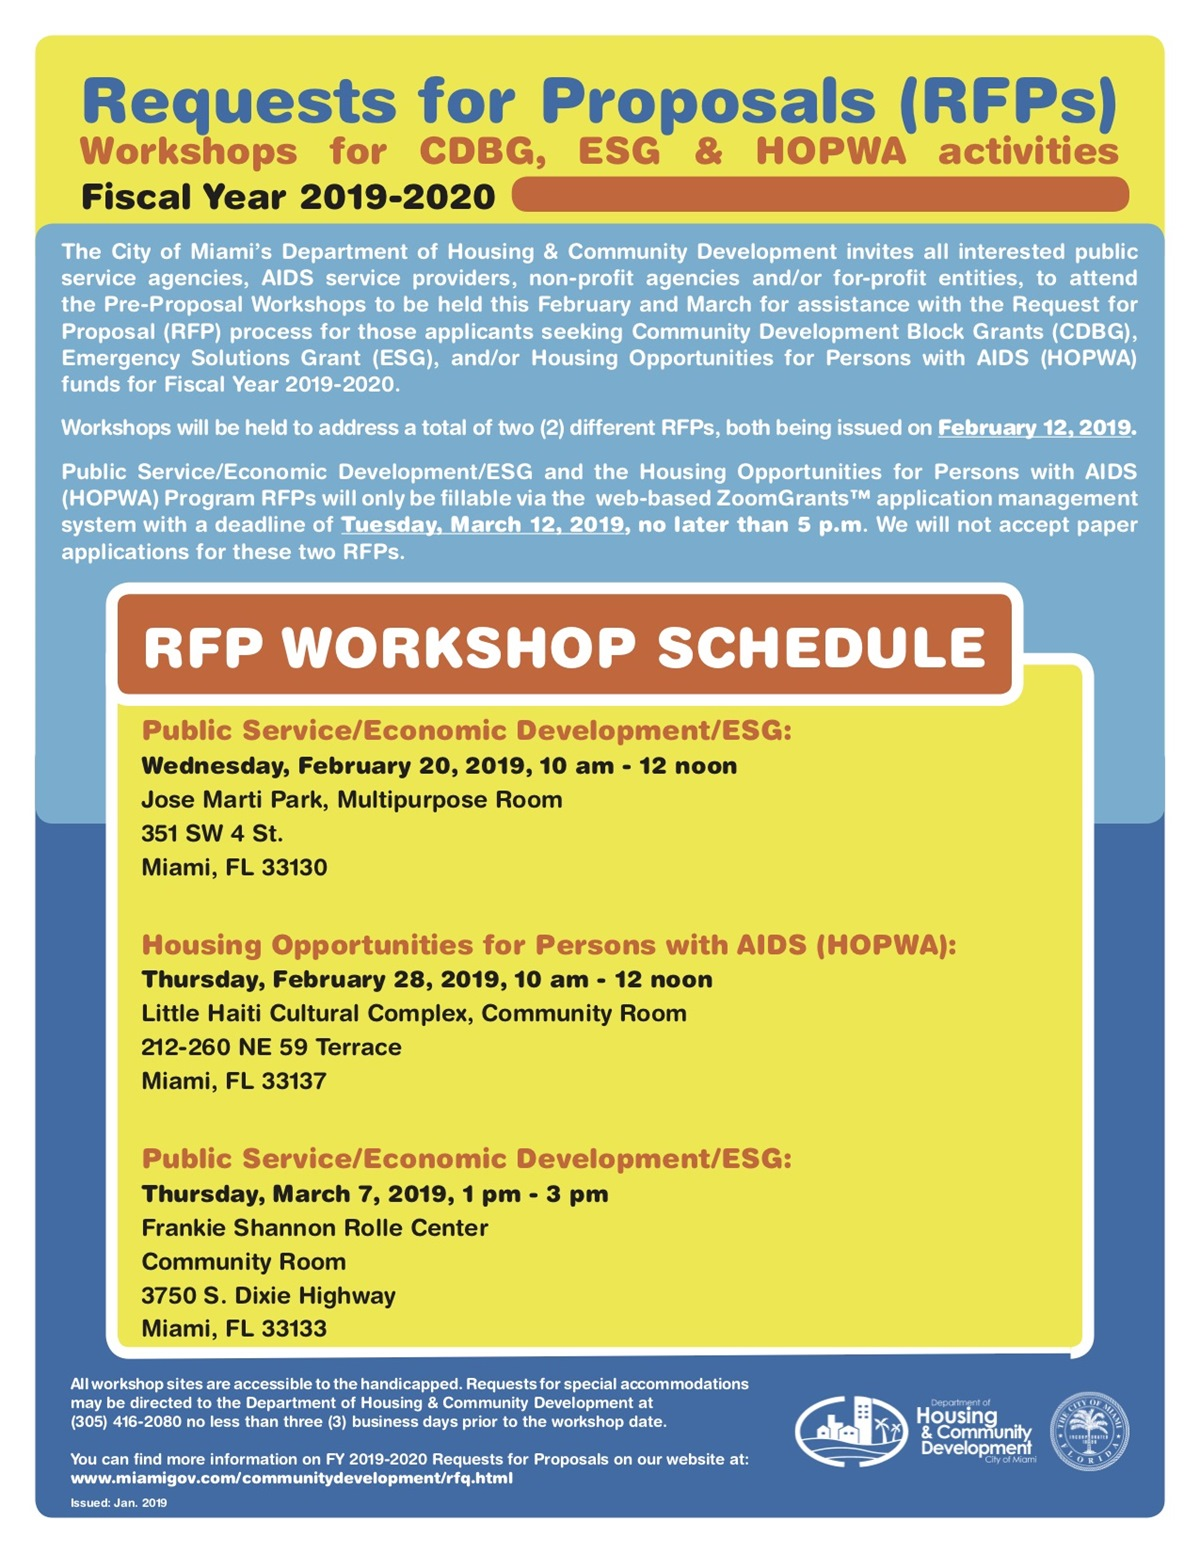 RFP Workshops - Miami